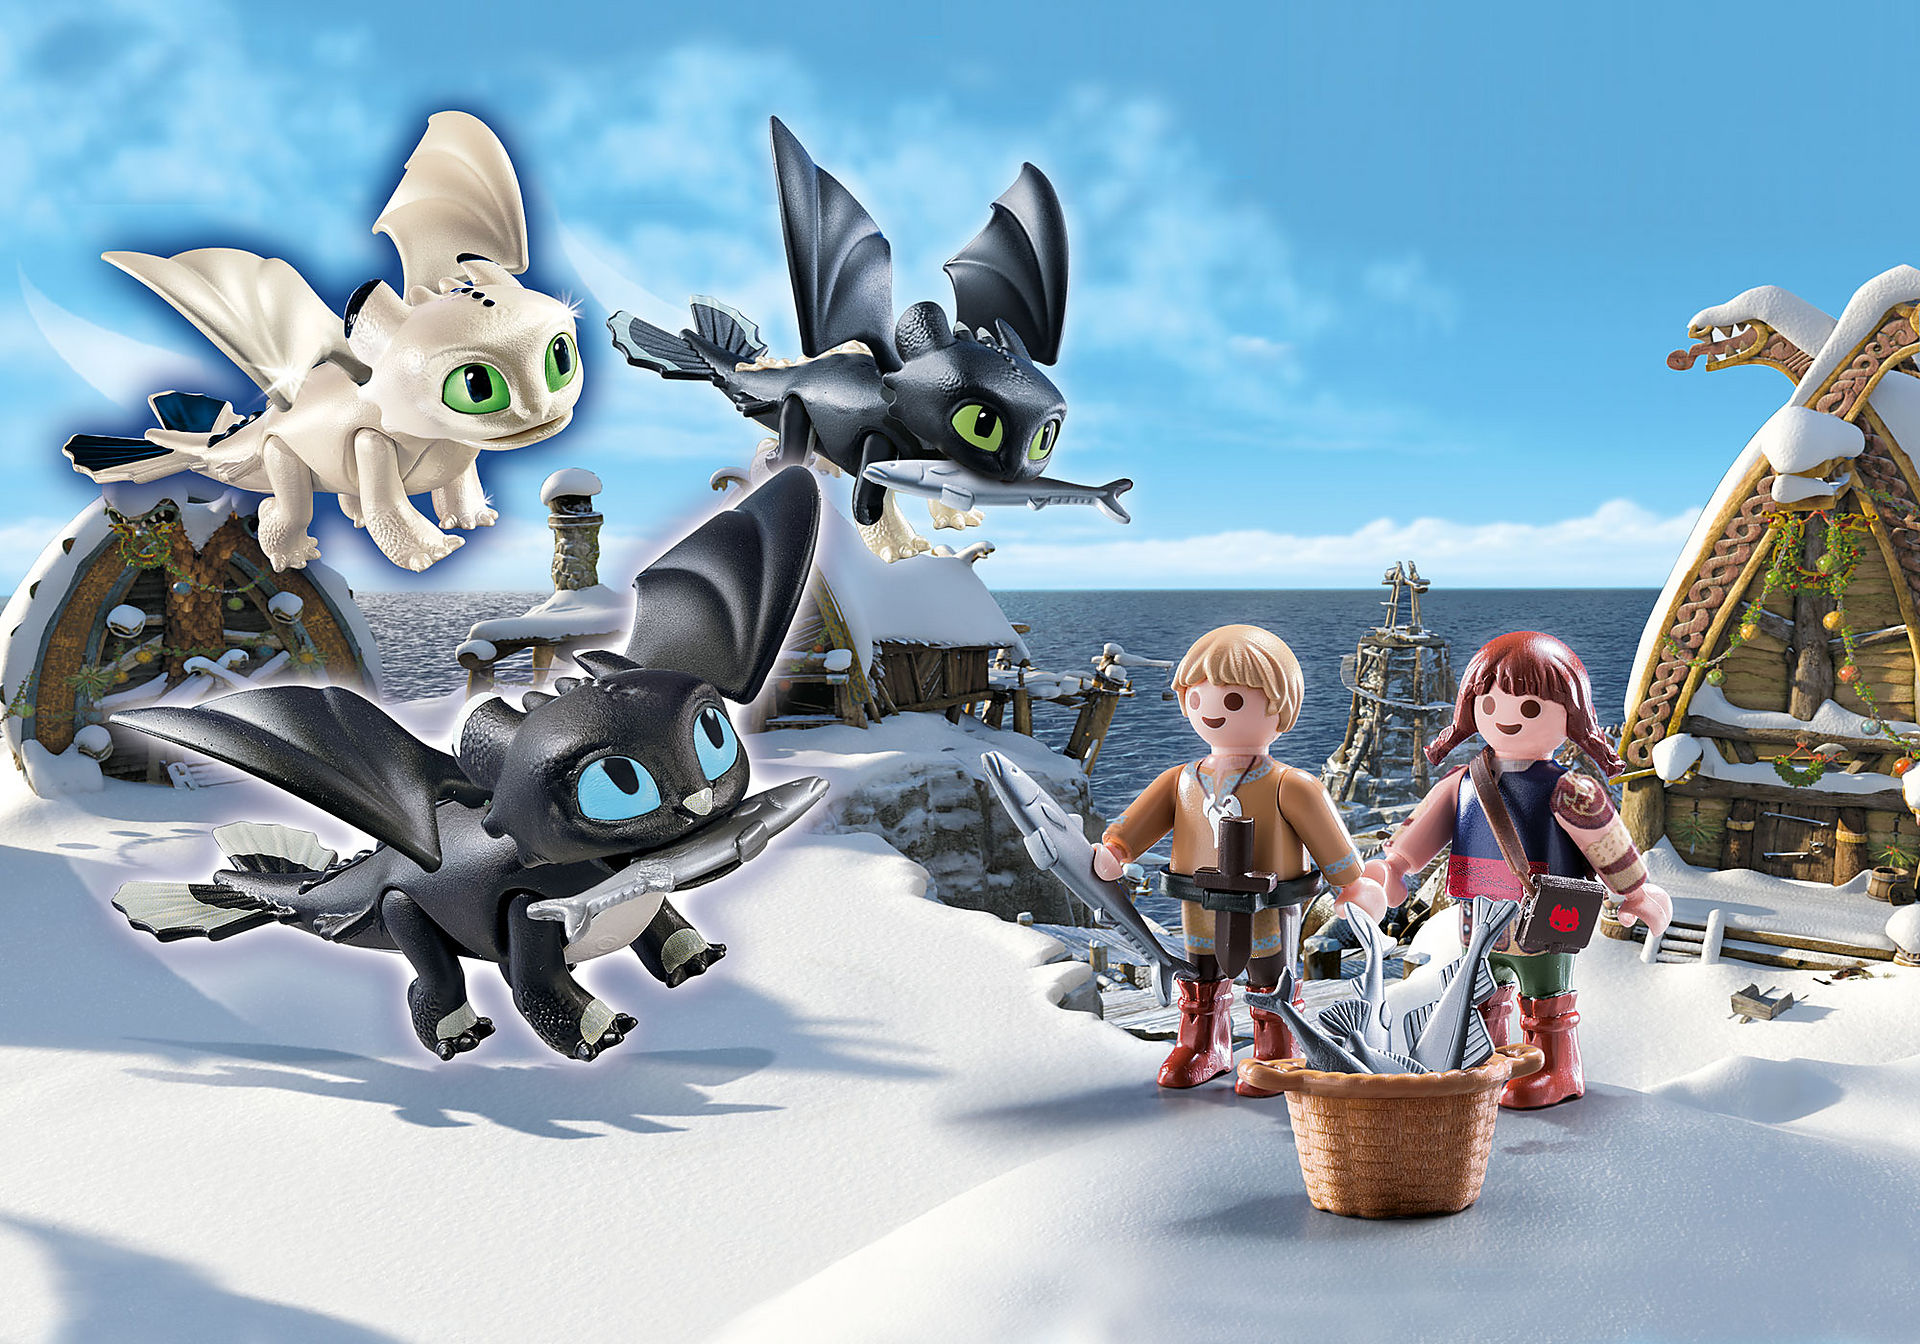 http://media.playmobil.com/i/playmobil/70457_product_detail/Dragones bebé con niños